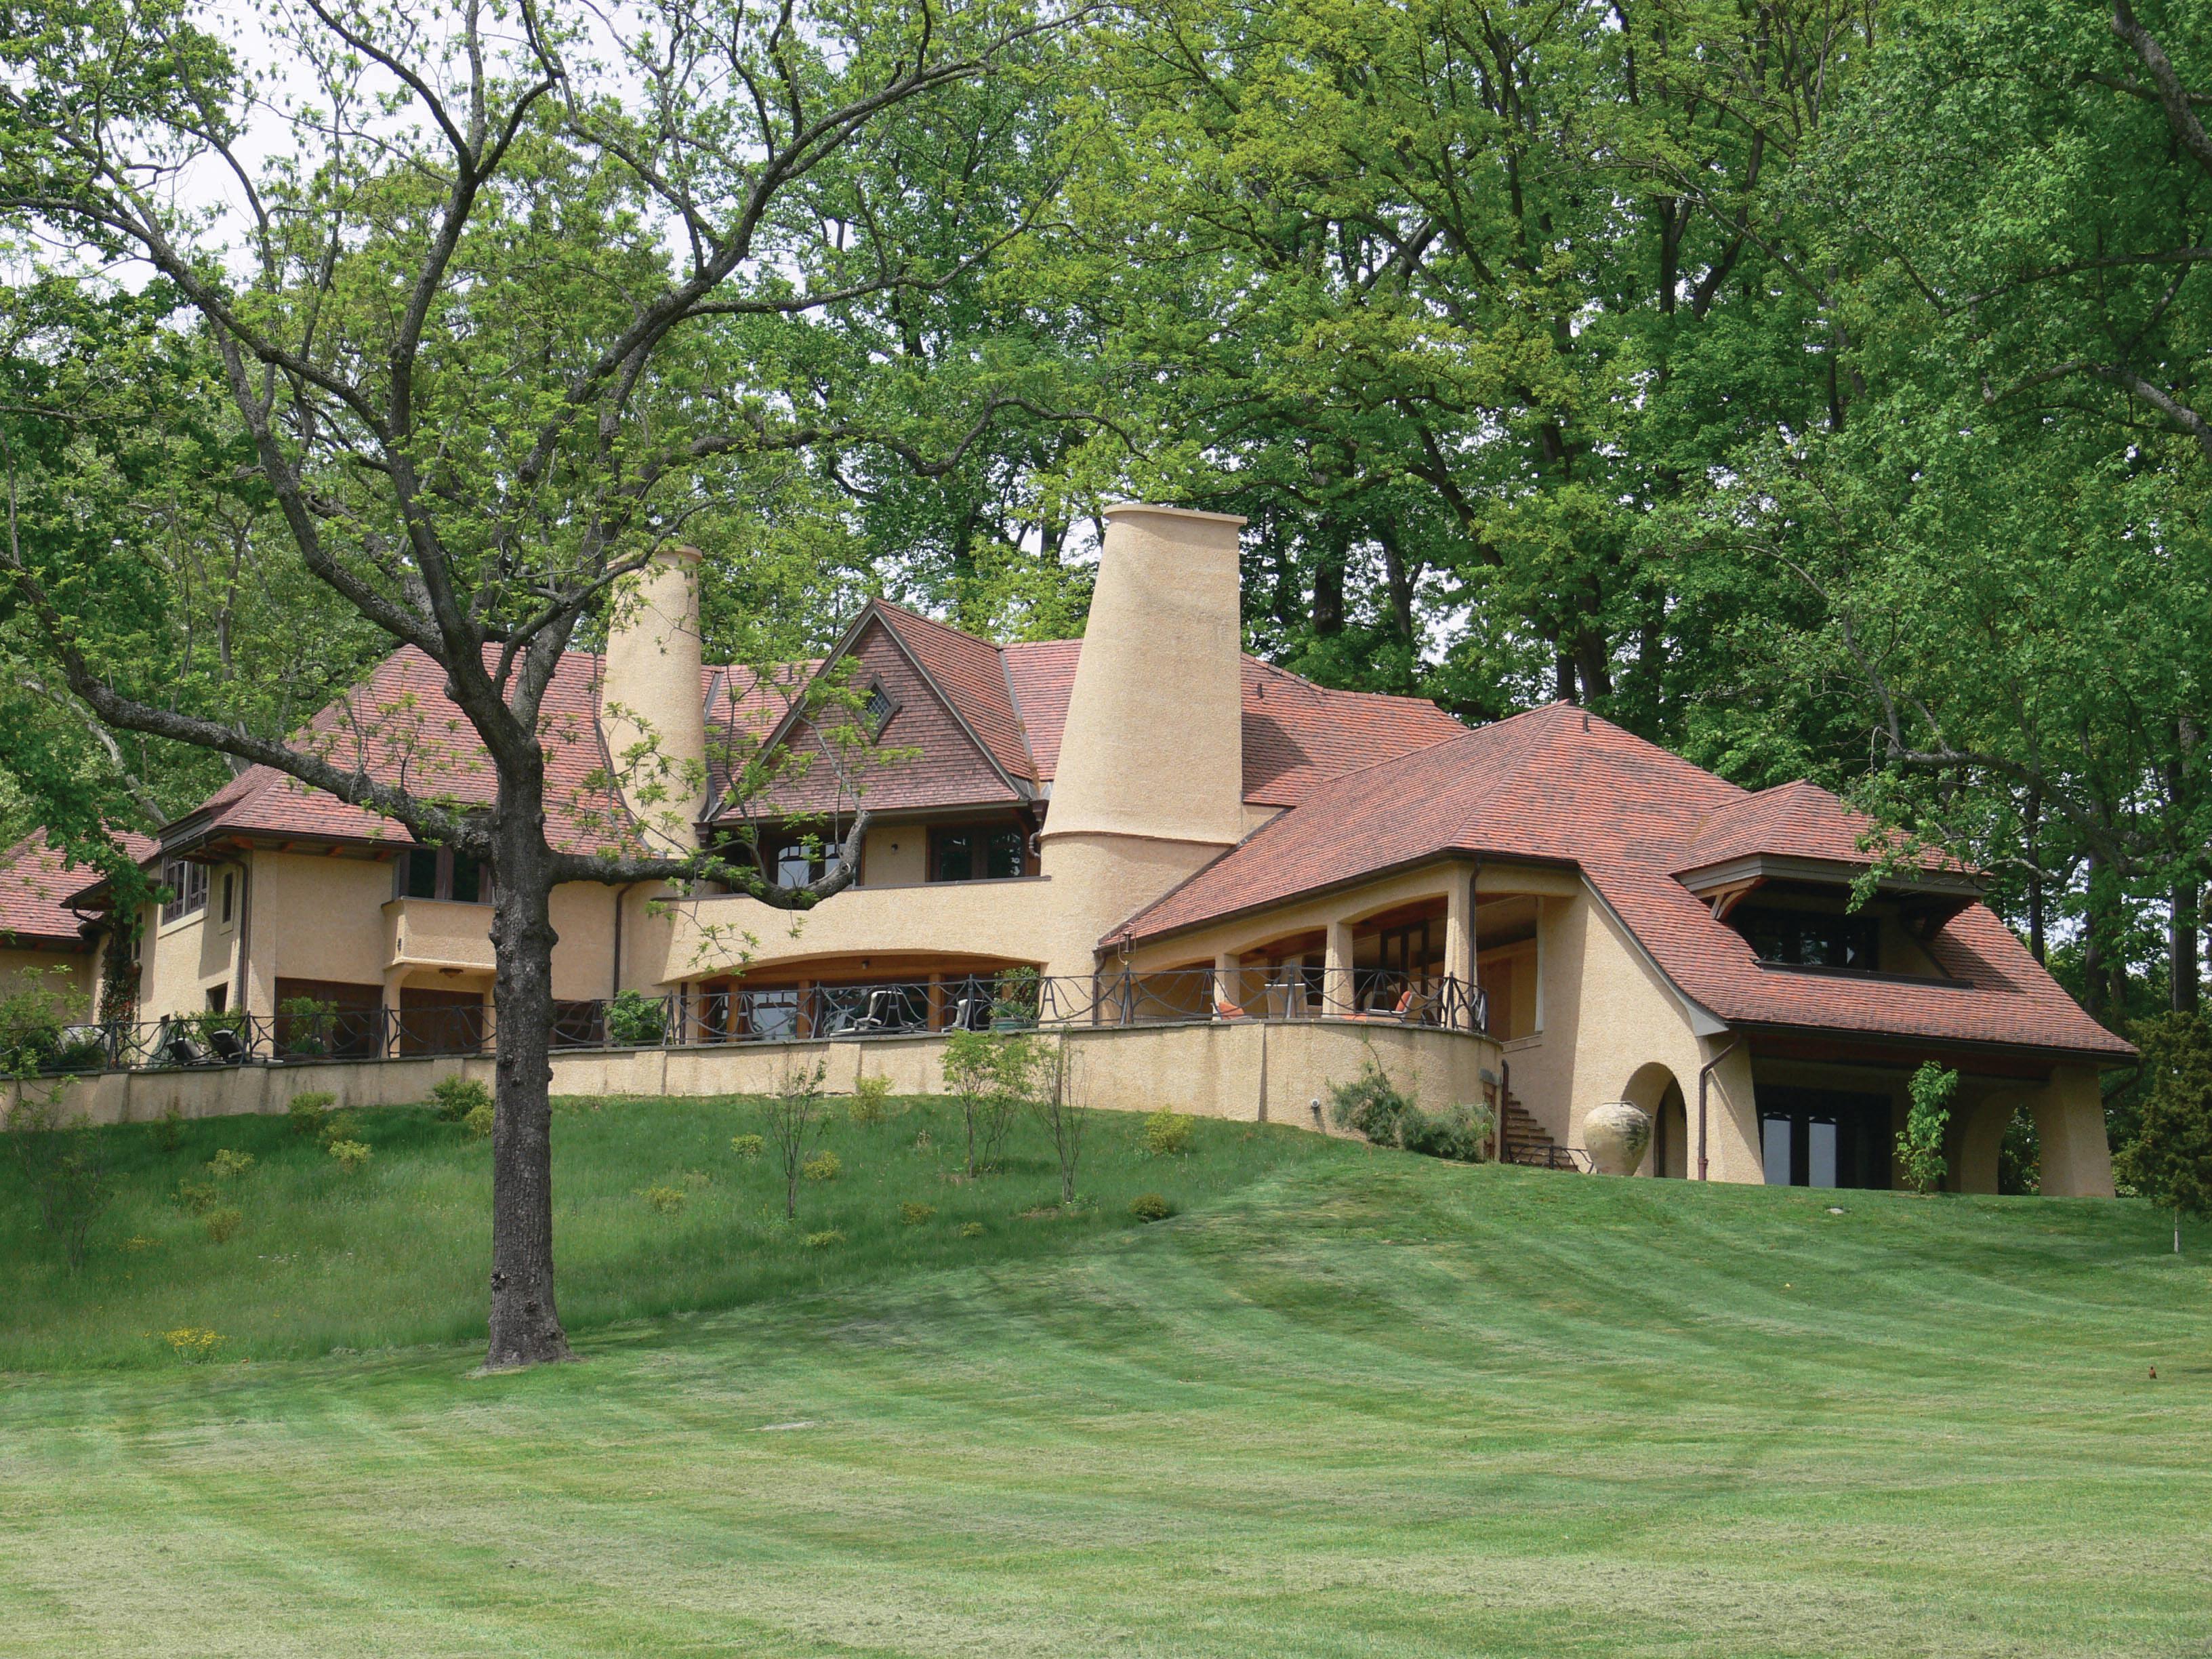 Residence in Berwyn Pennsylvania